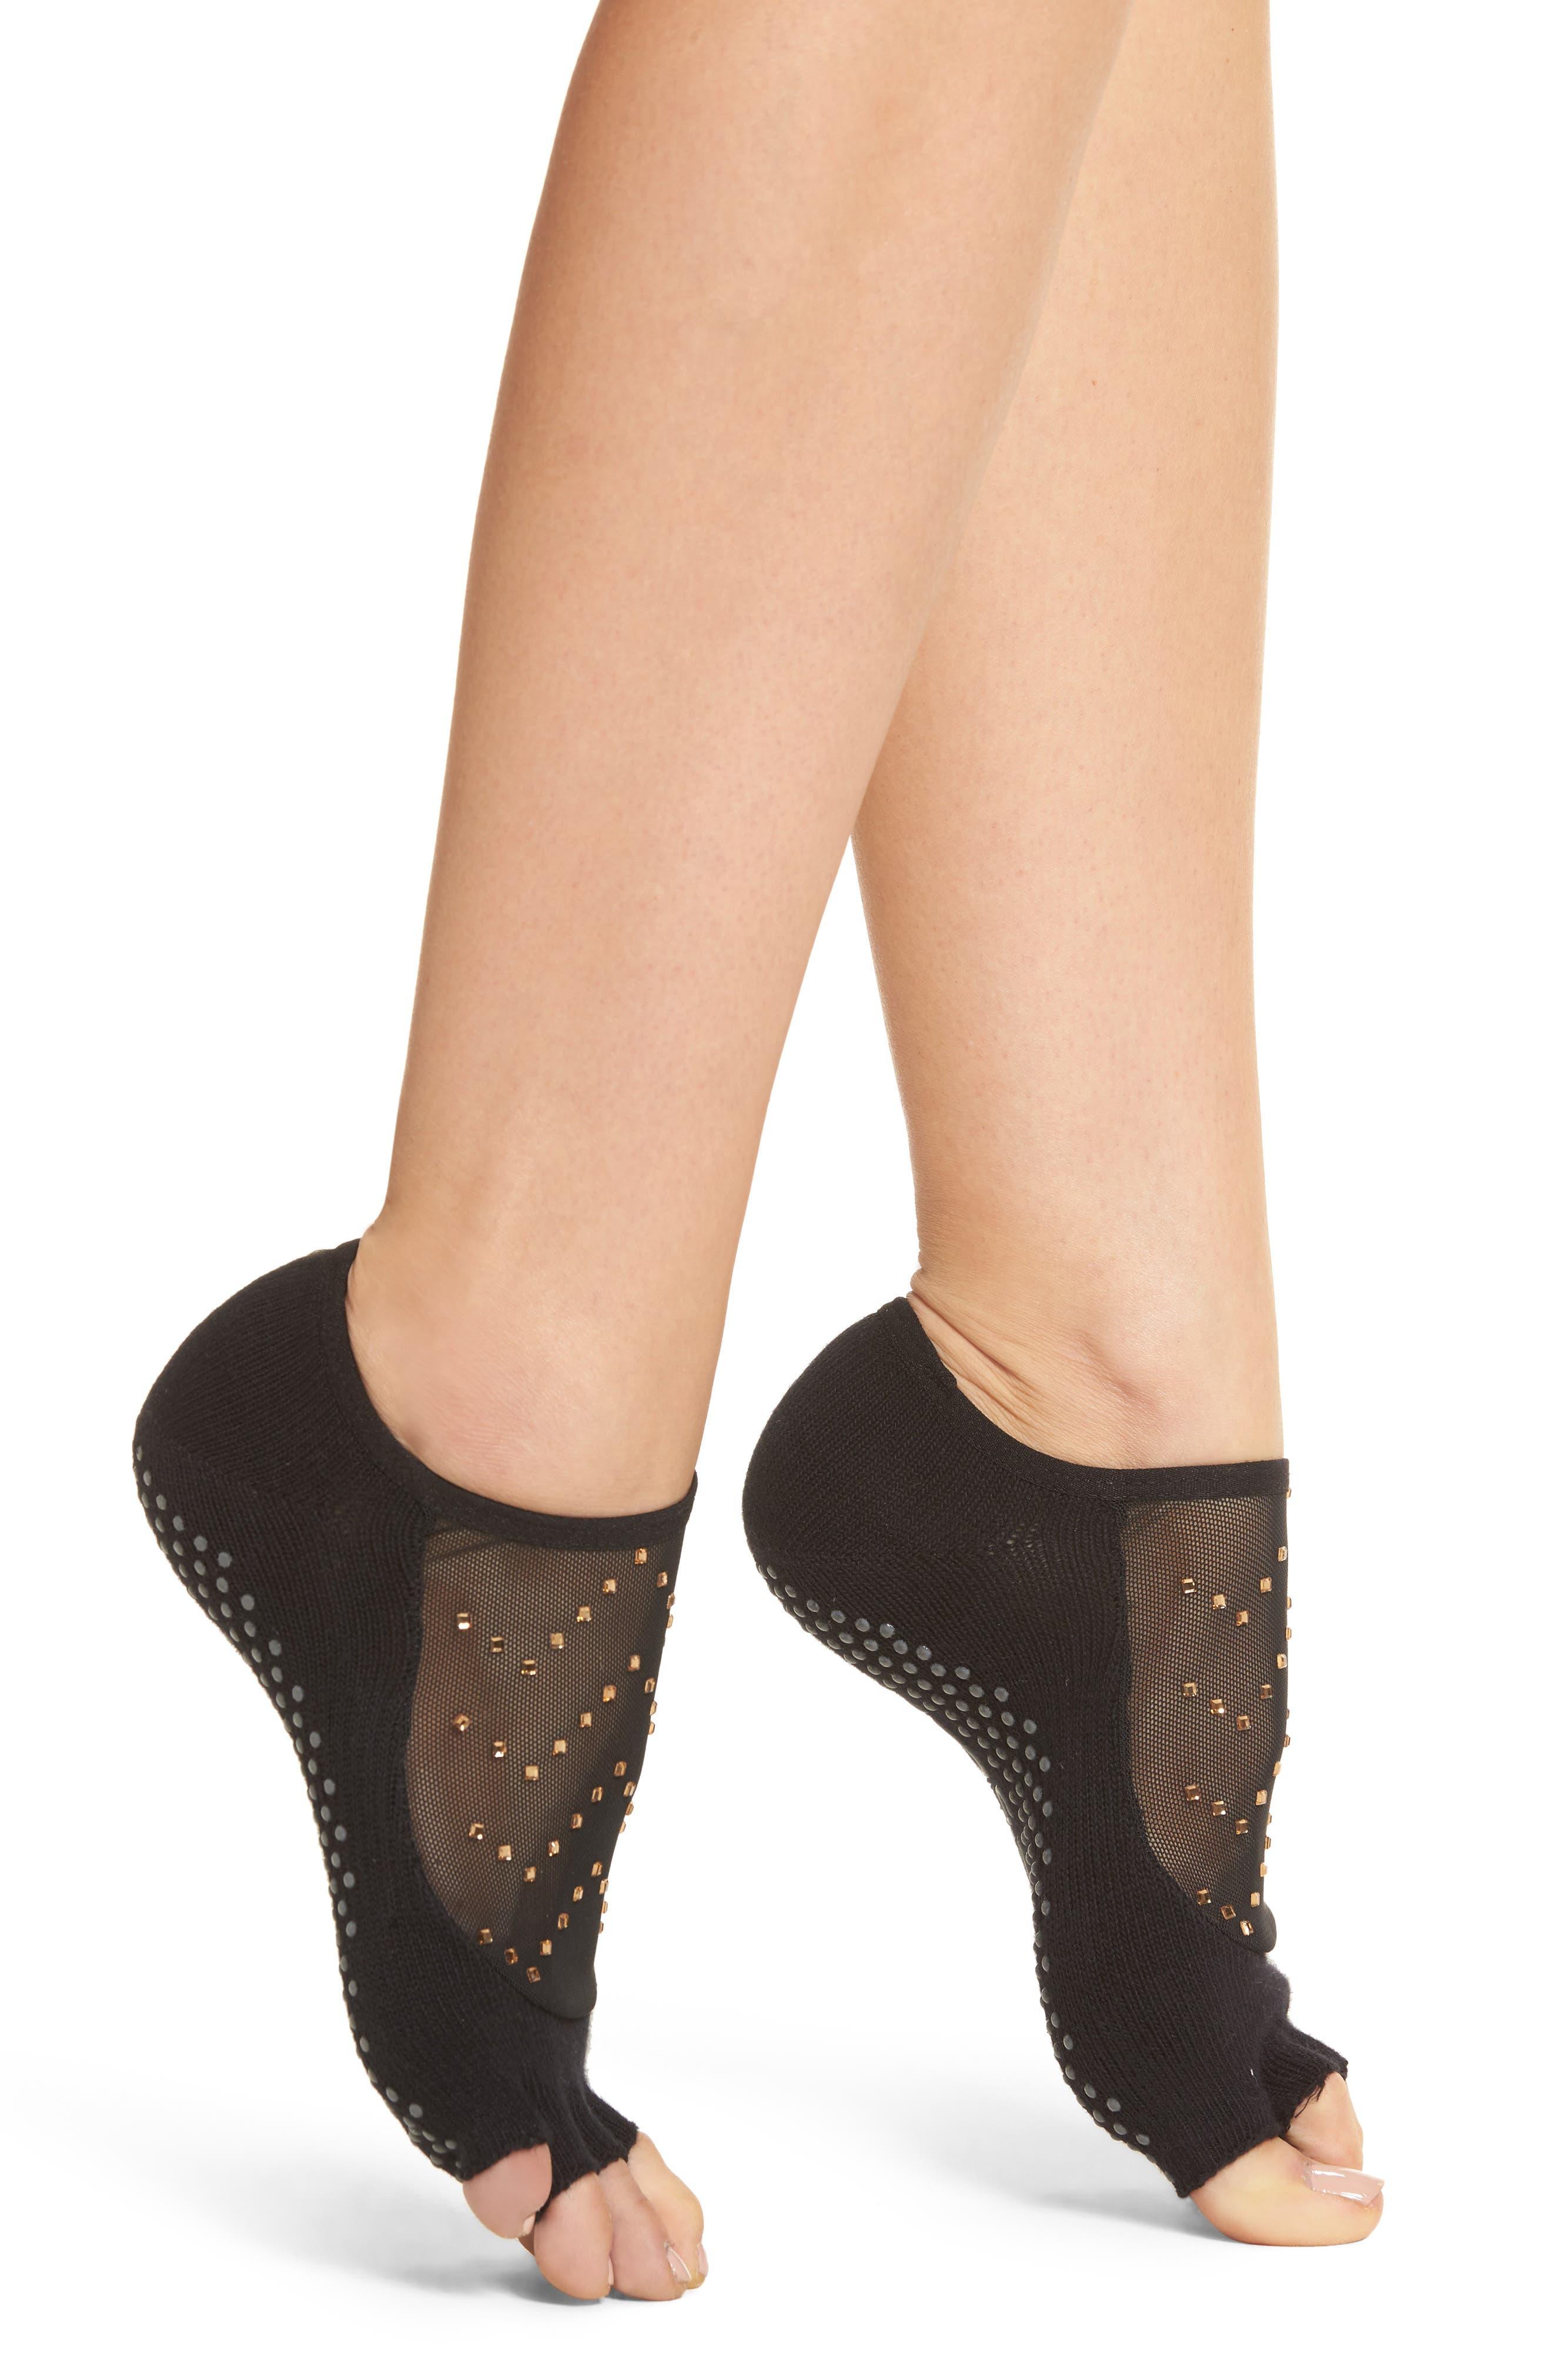 Luna Half Toe Gripper Socks,                         Main,                         color, Twilight